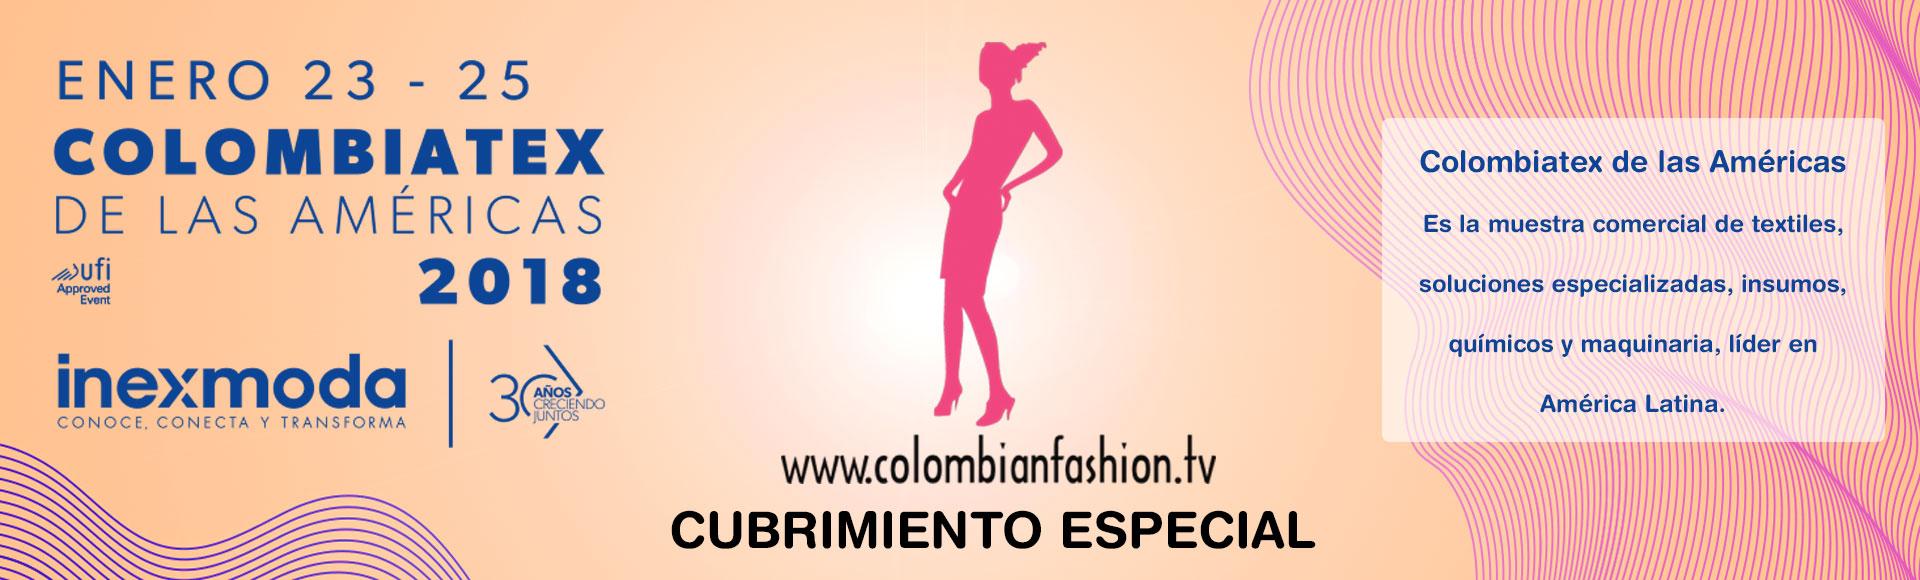 colombiatex2018